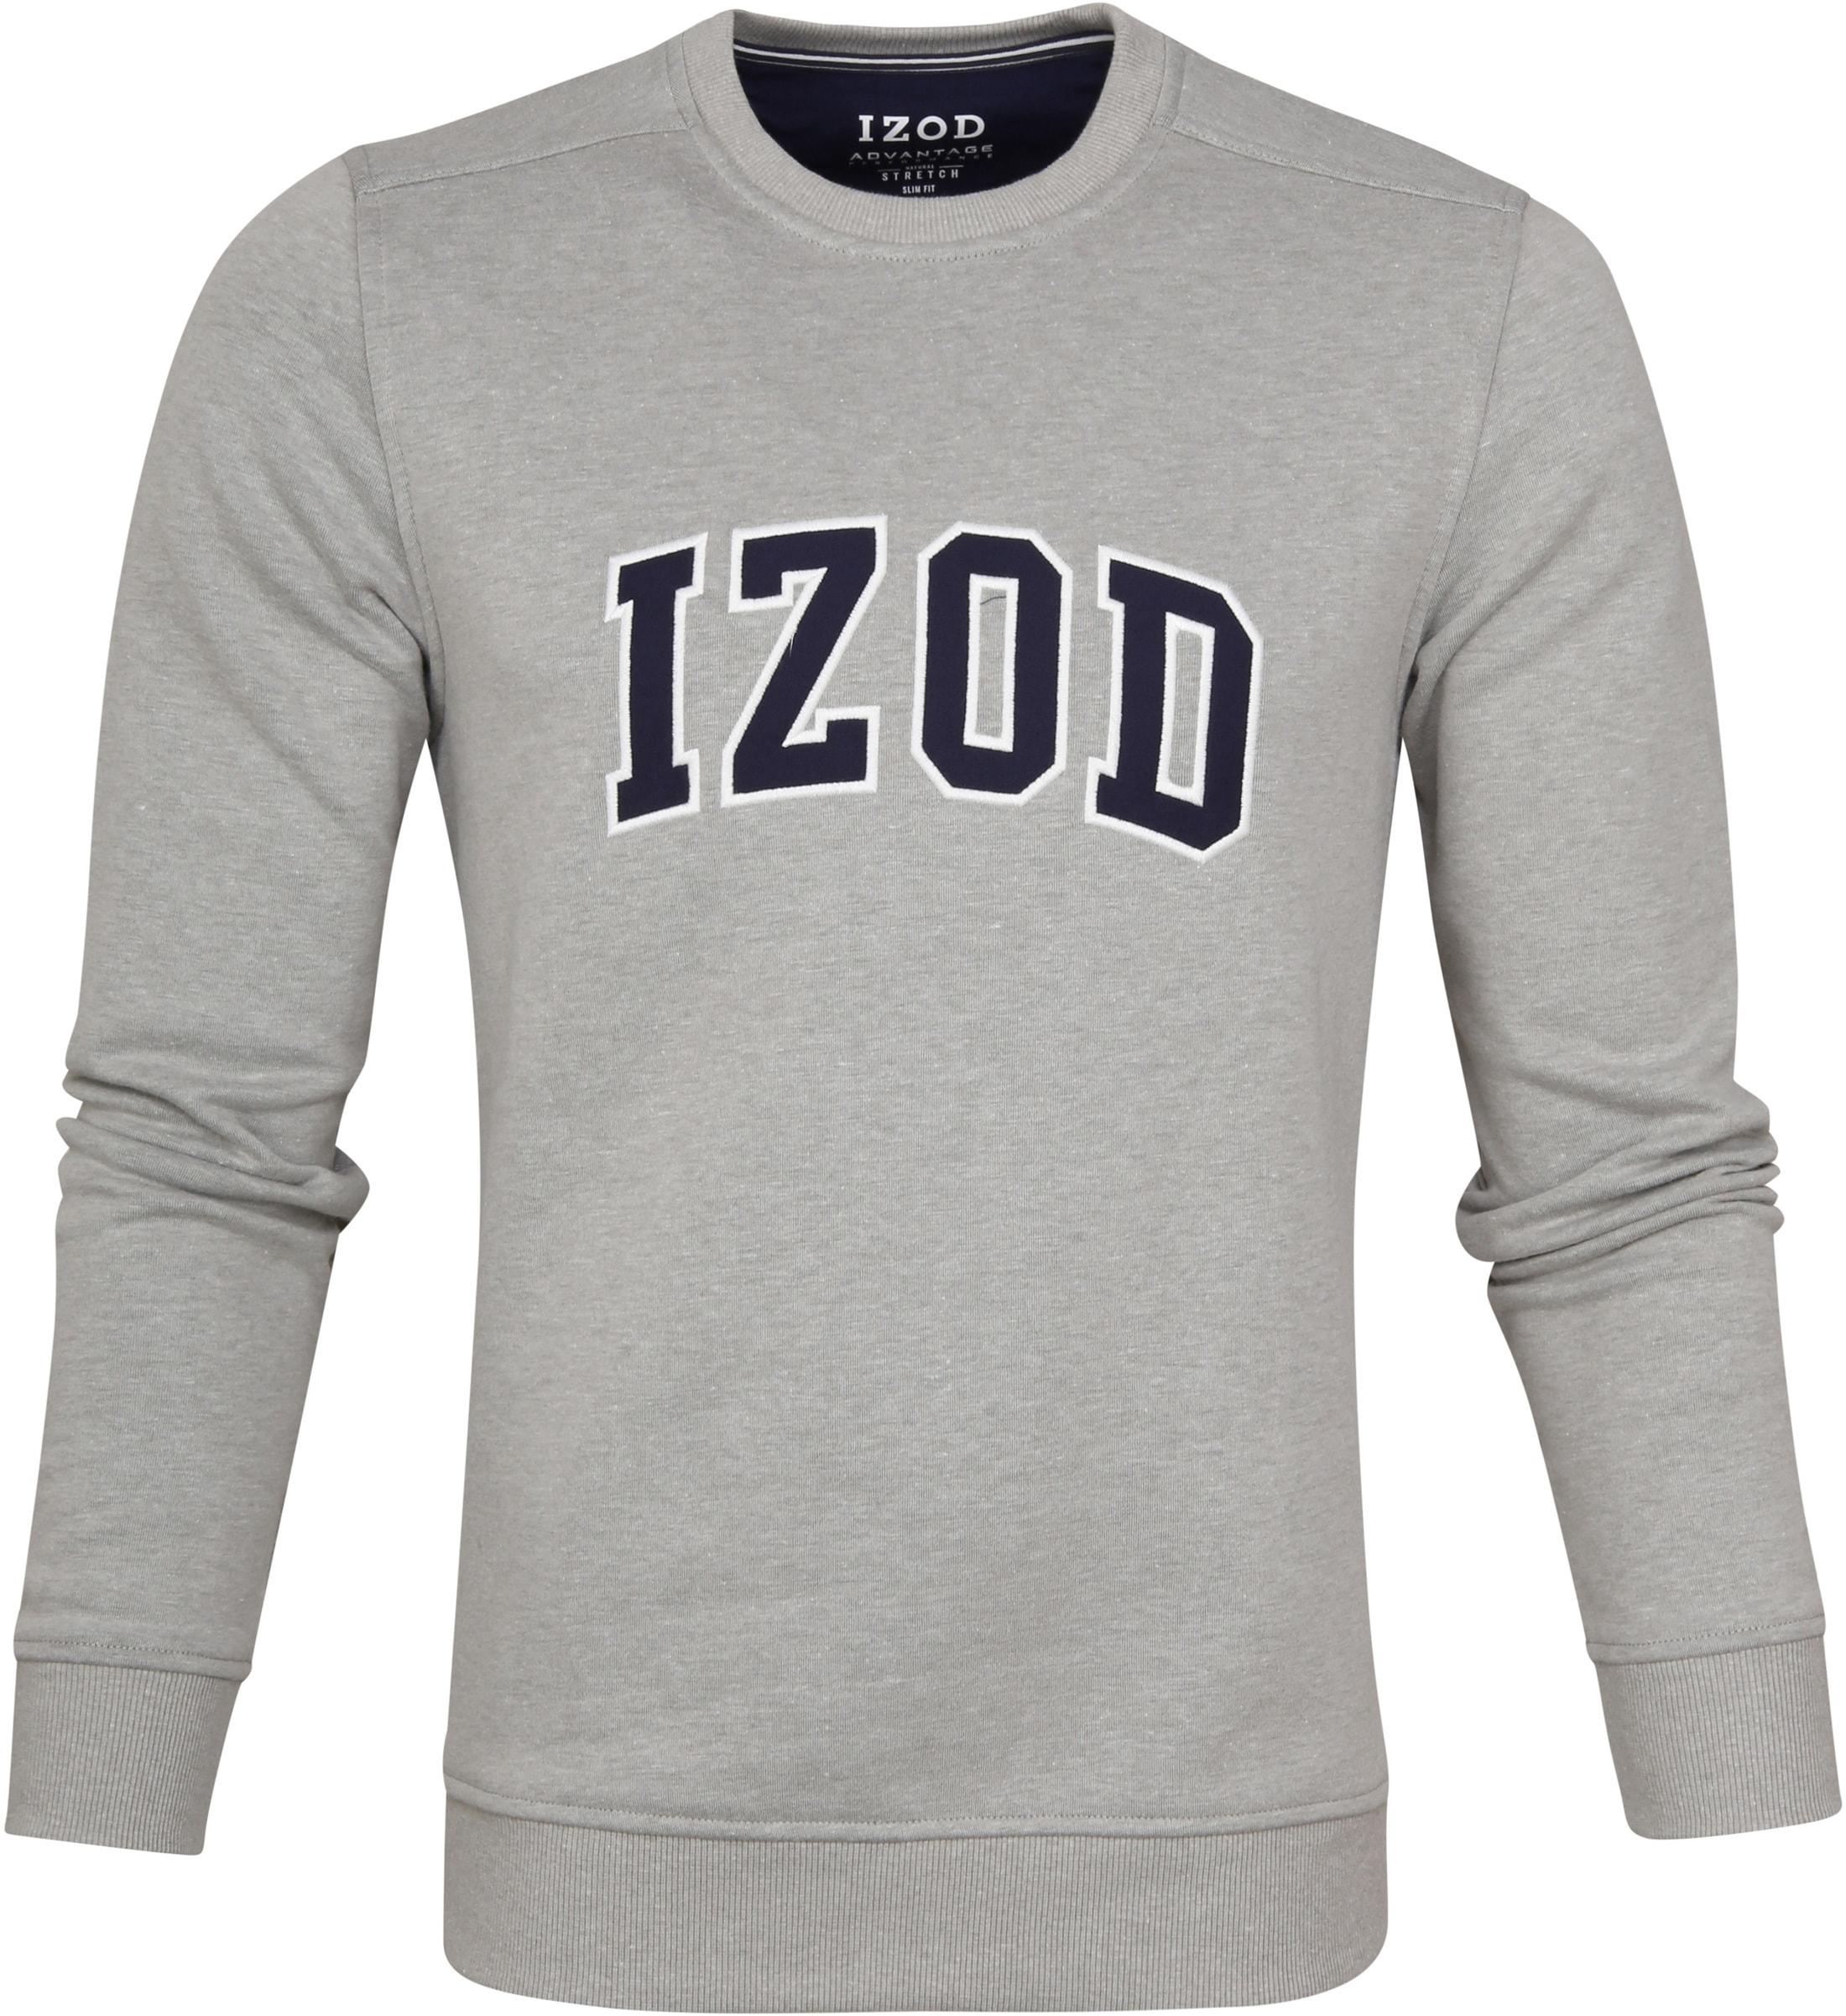 IZOD Fleece Sweater Sport Flex Hellgrau foto 0